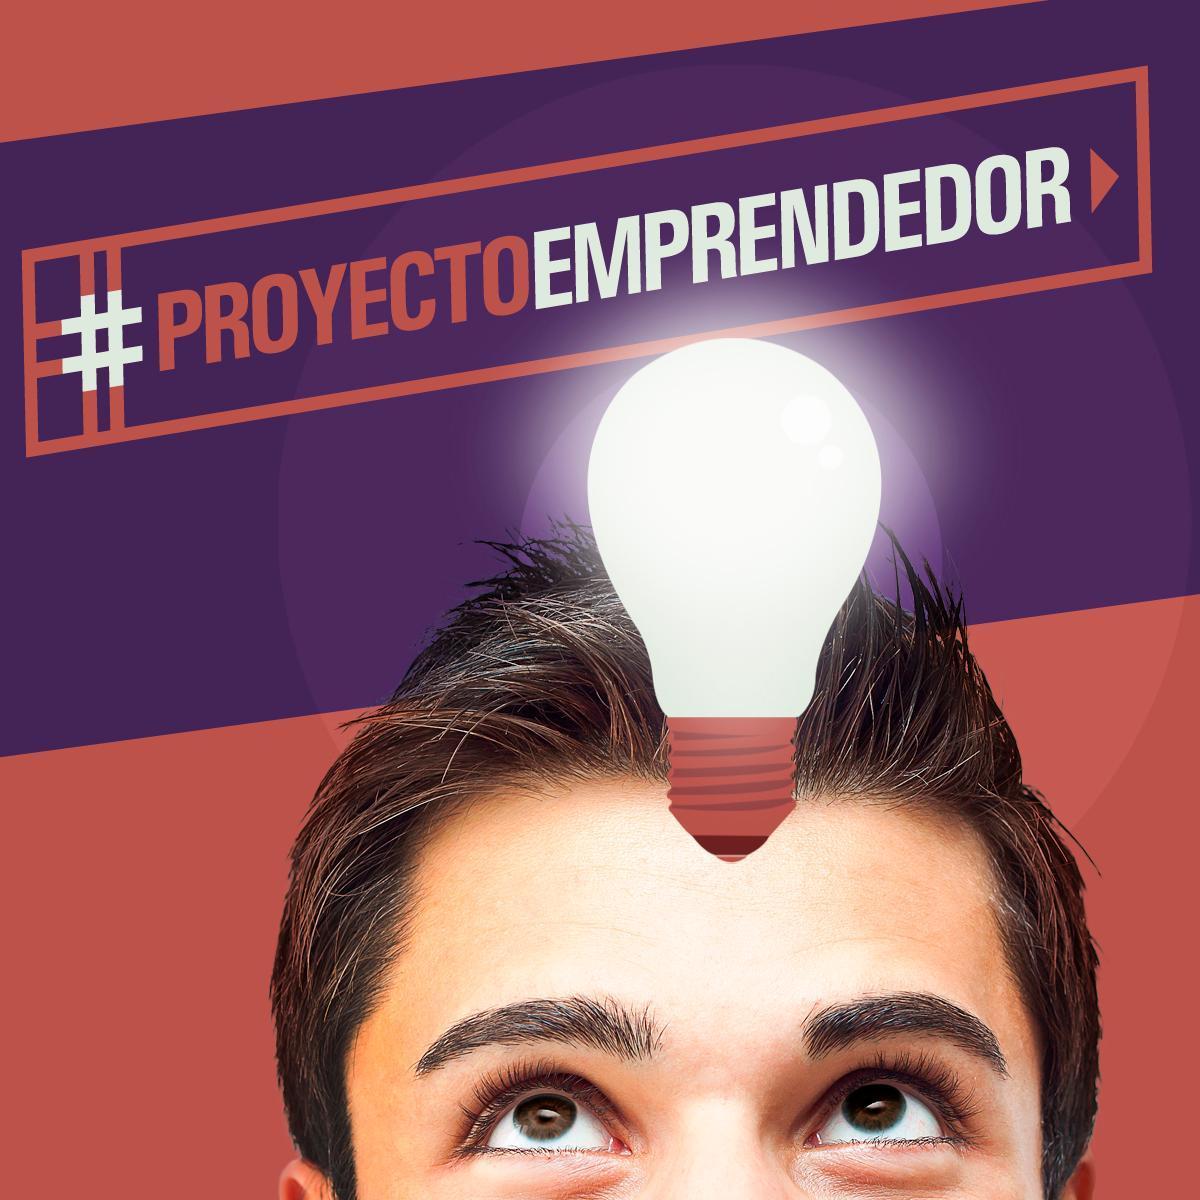 @EmprendedorP40